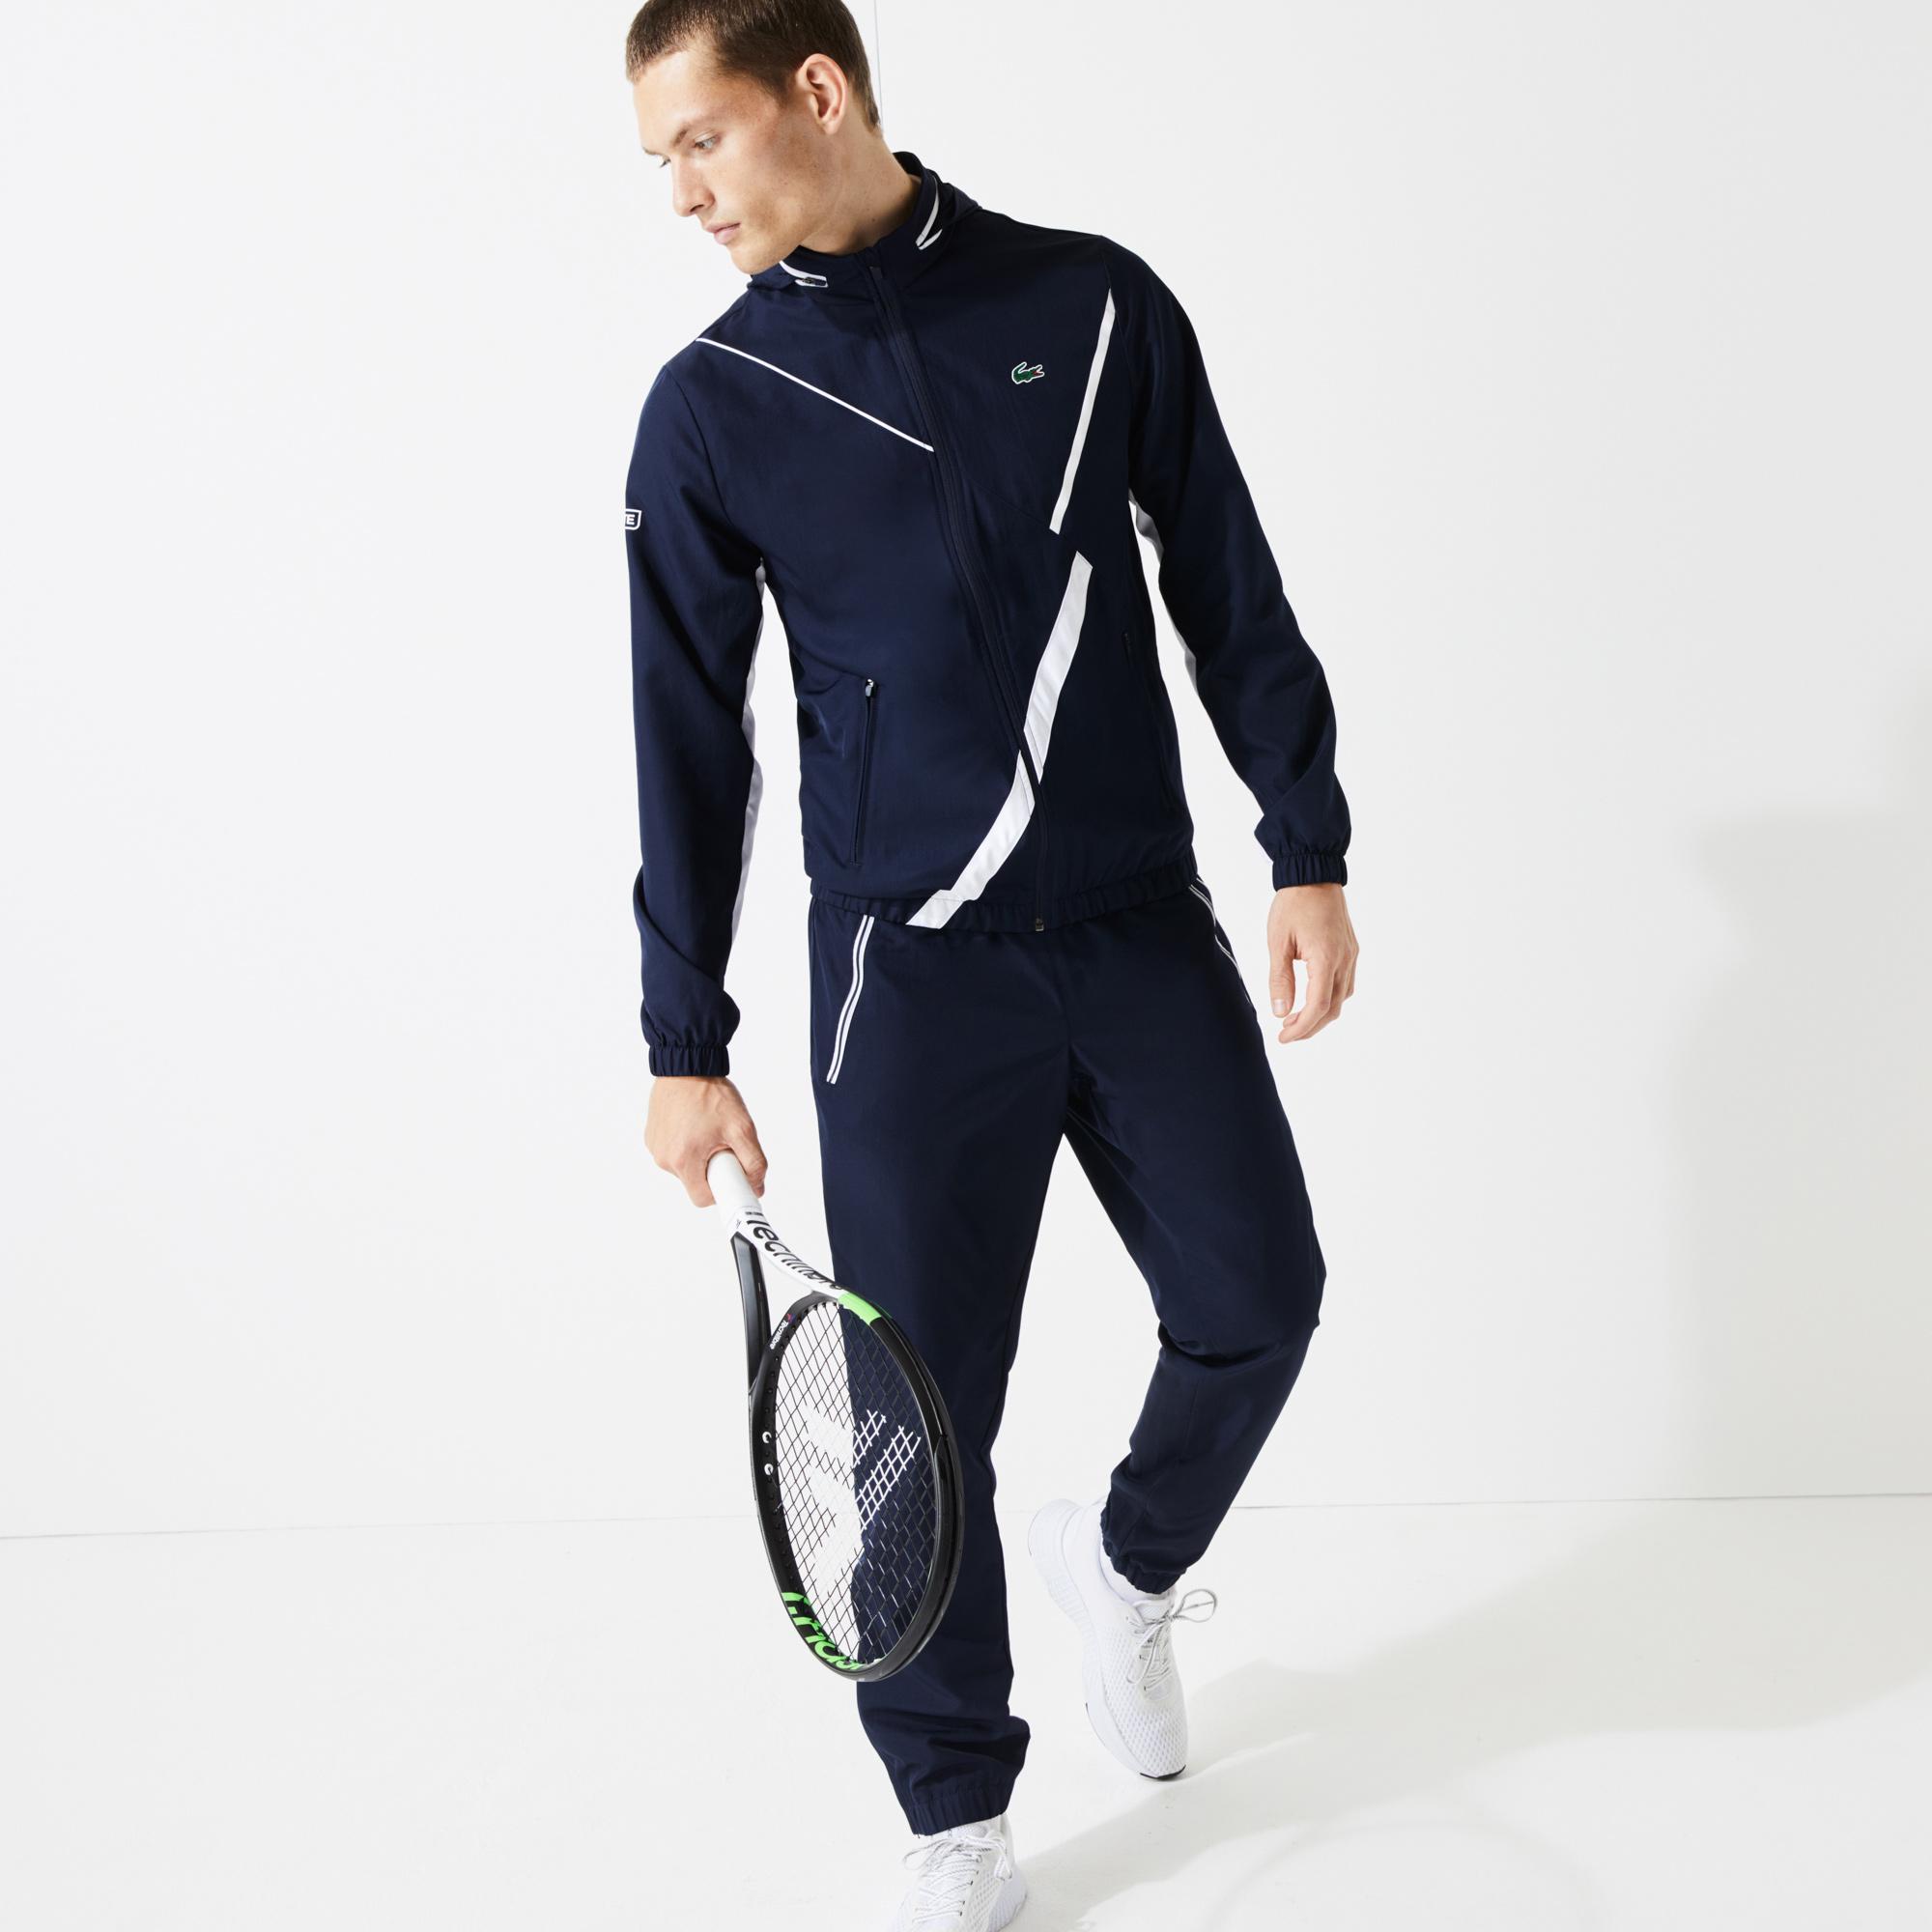 Lacoste Men's SPORT Dissimilar Tennis Tracksuit